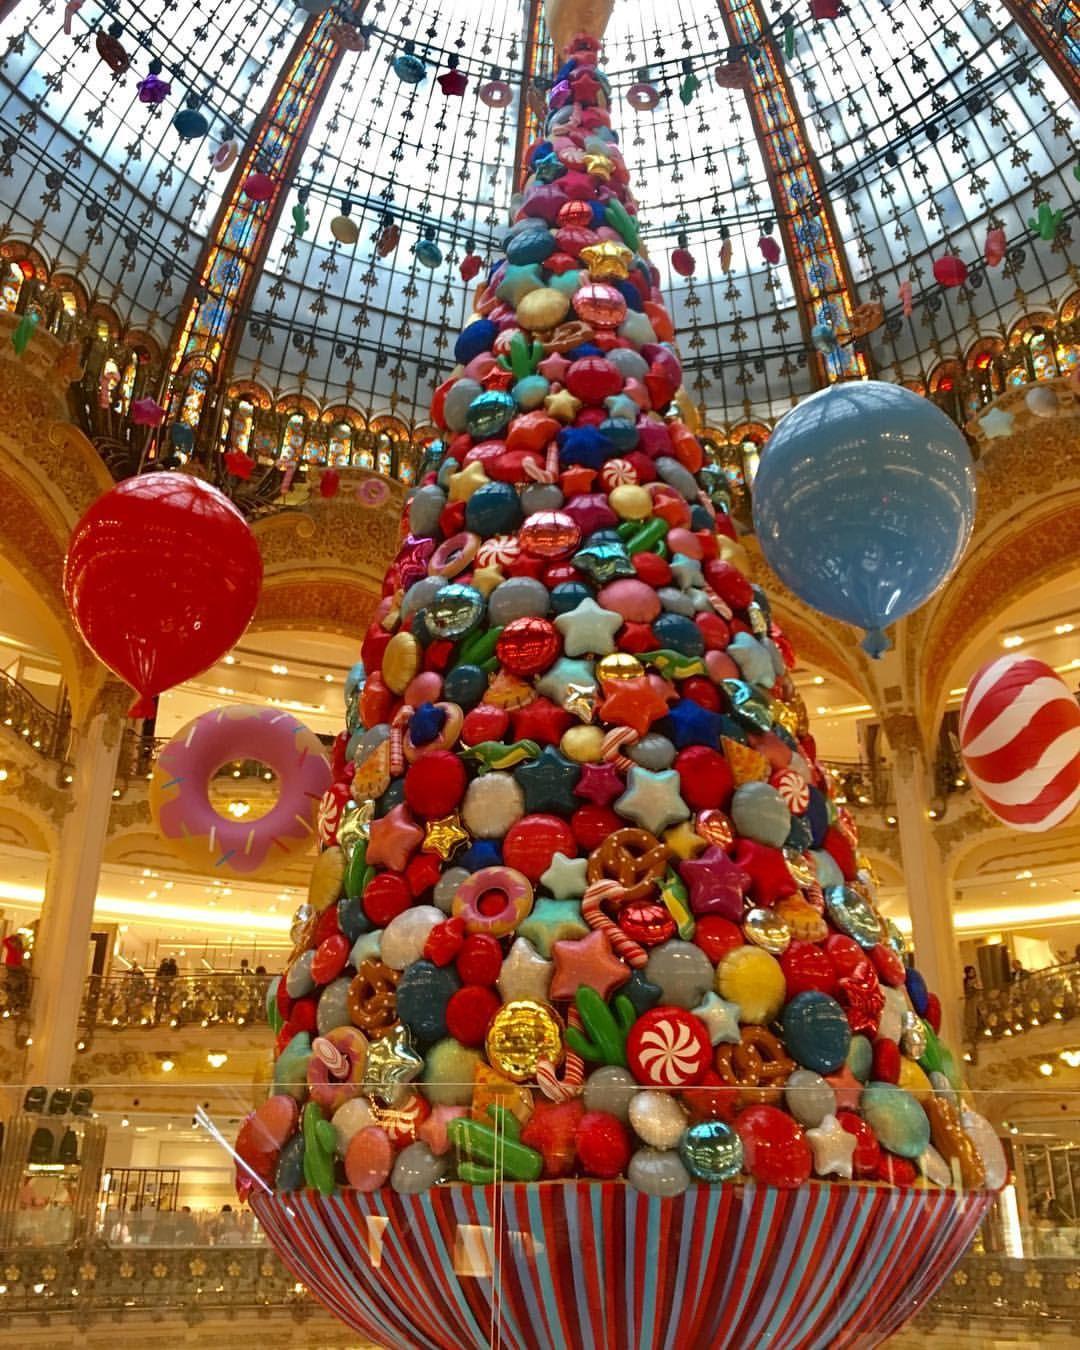 Galeries Lafayette Paris France The Sweet Christmas Tree Photo By Mariko Pinned By Ton Van Der Veer Christmas In Paris Christmas Diy Christmas Storage